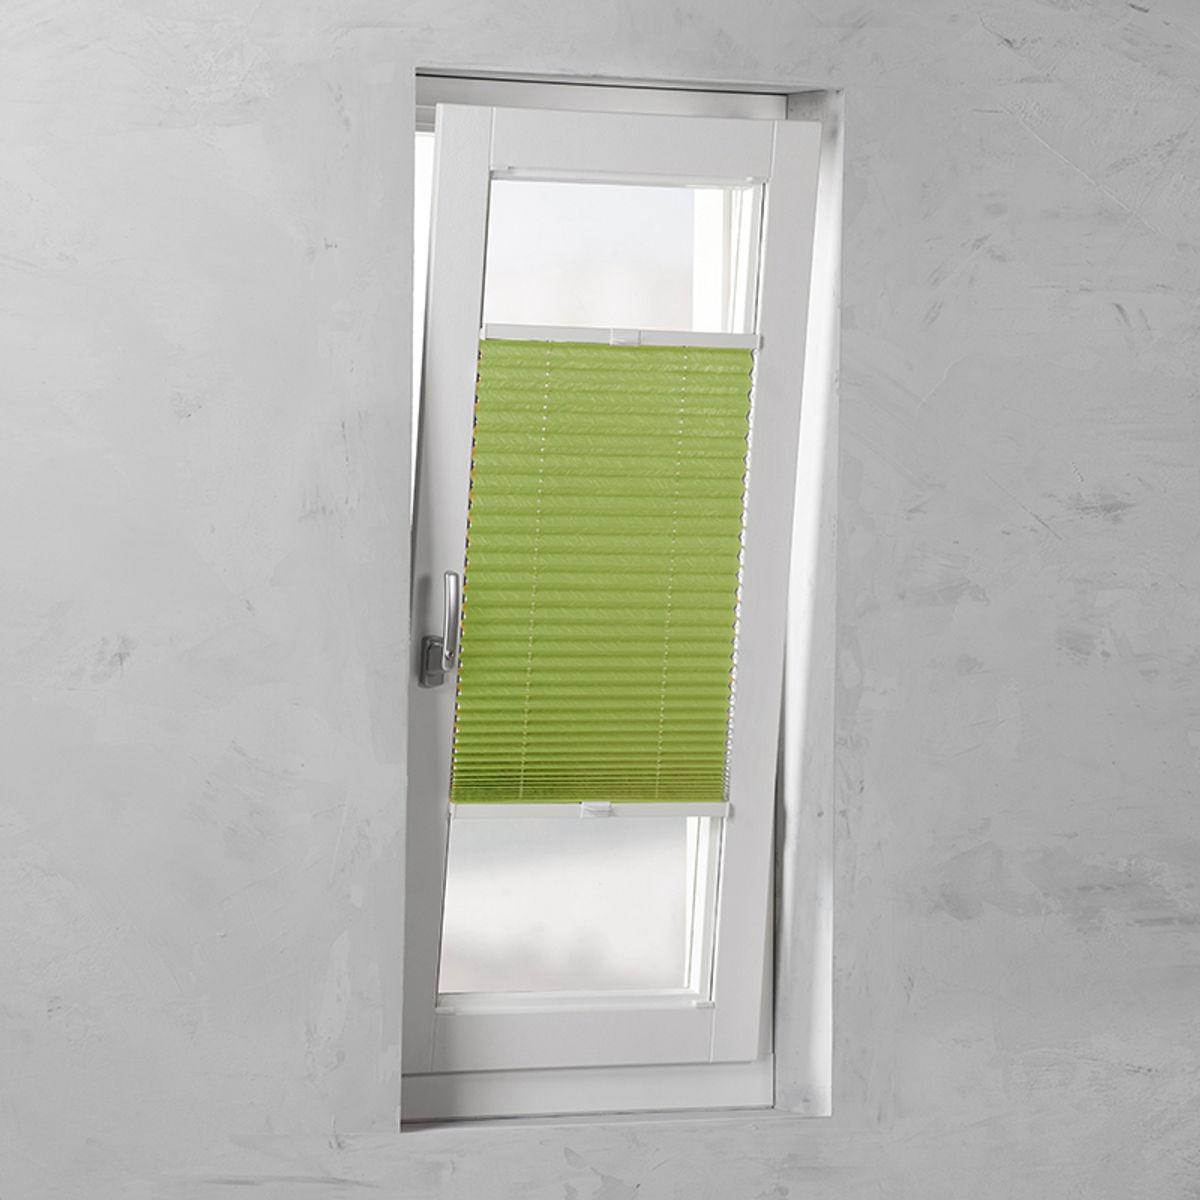 Plisségordijn gespannen - Lichtdoorlatend - Groen - 70cm x 130cm